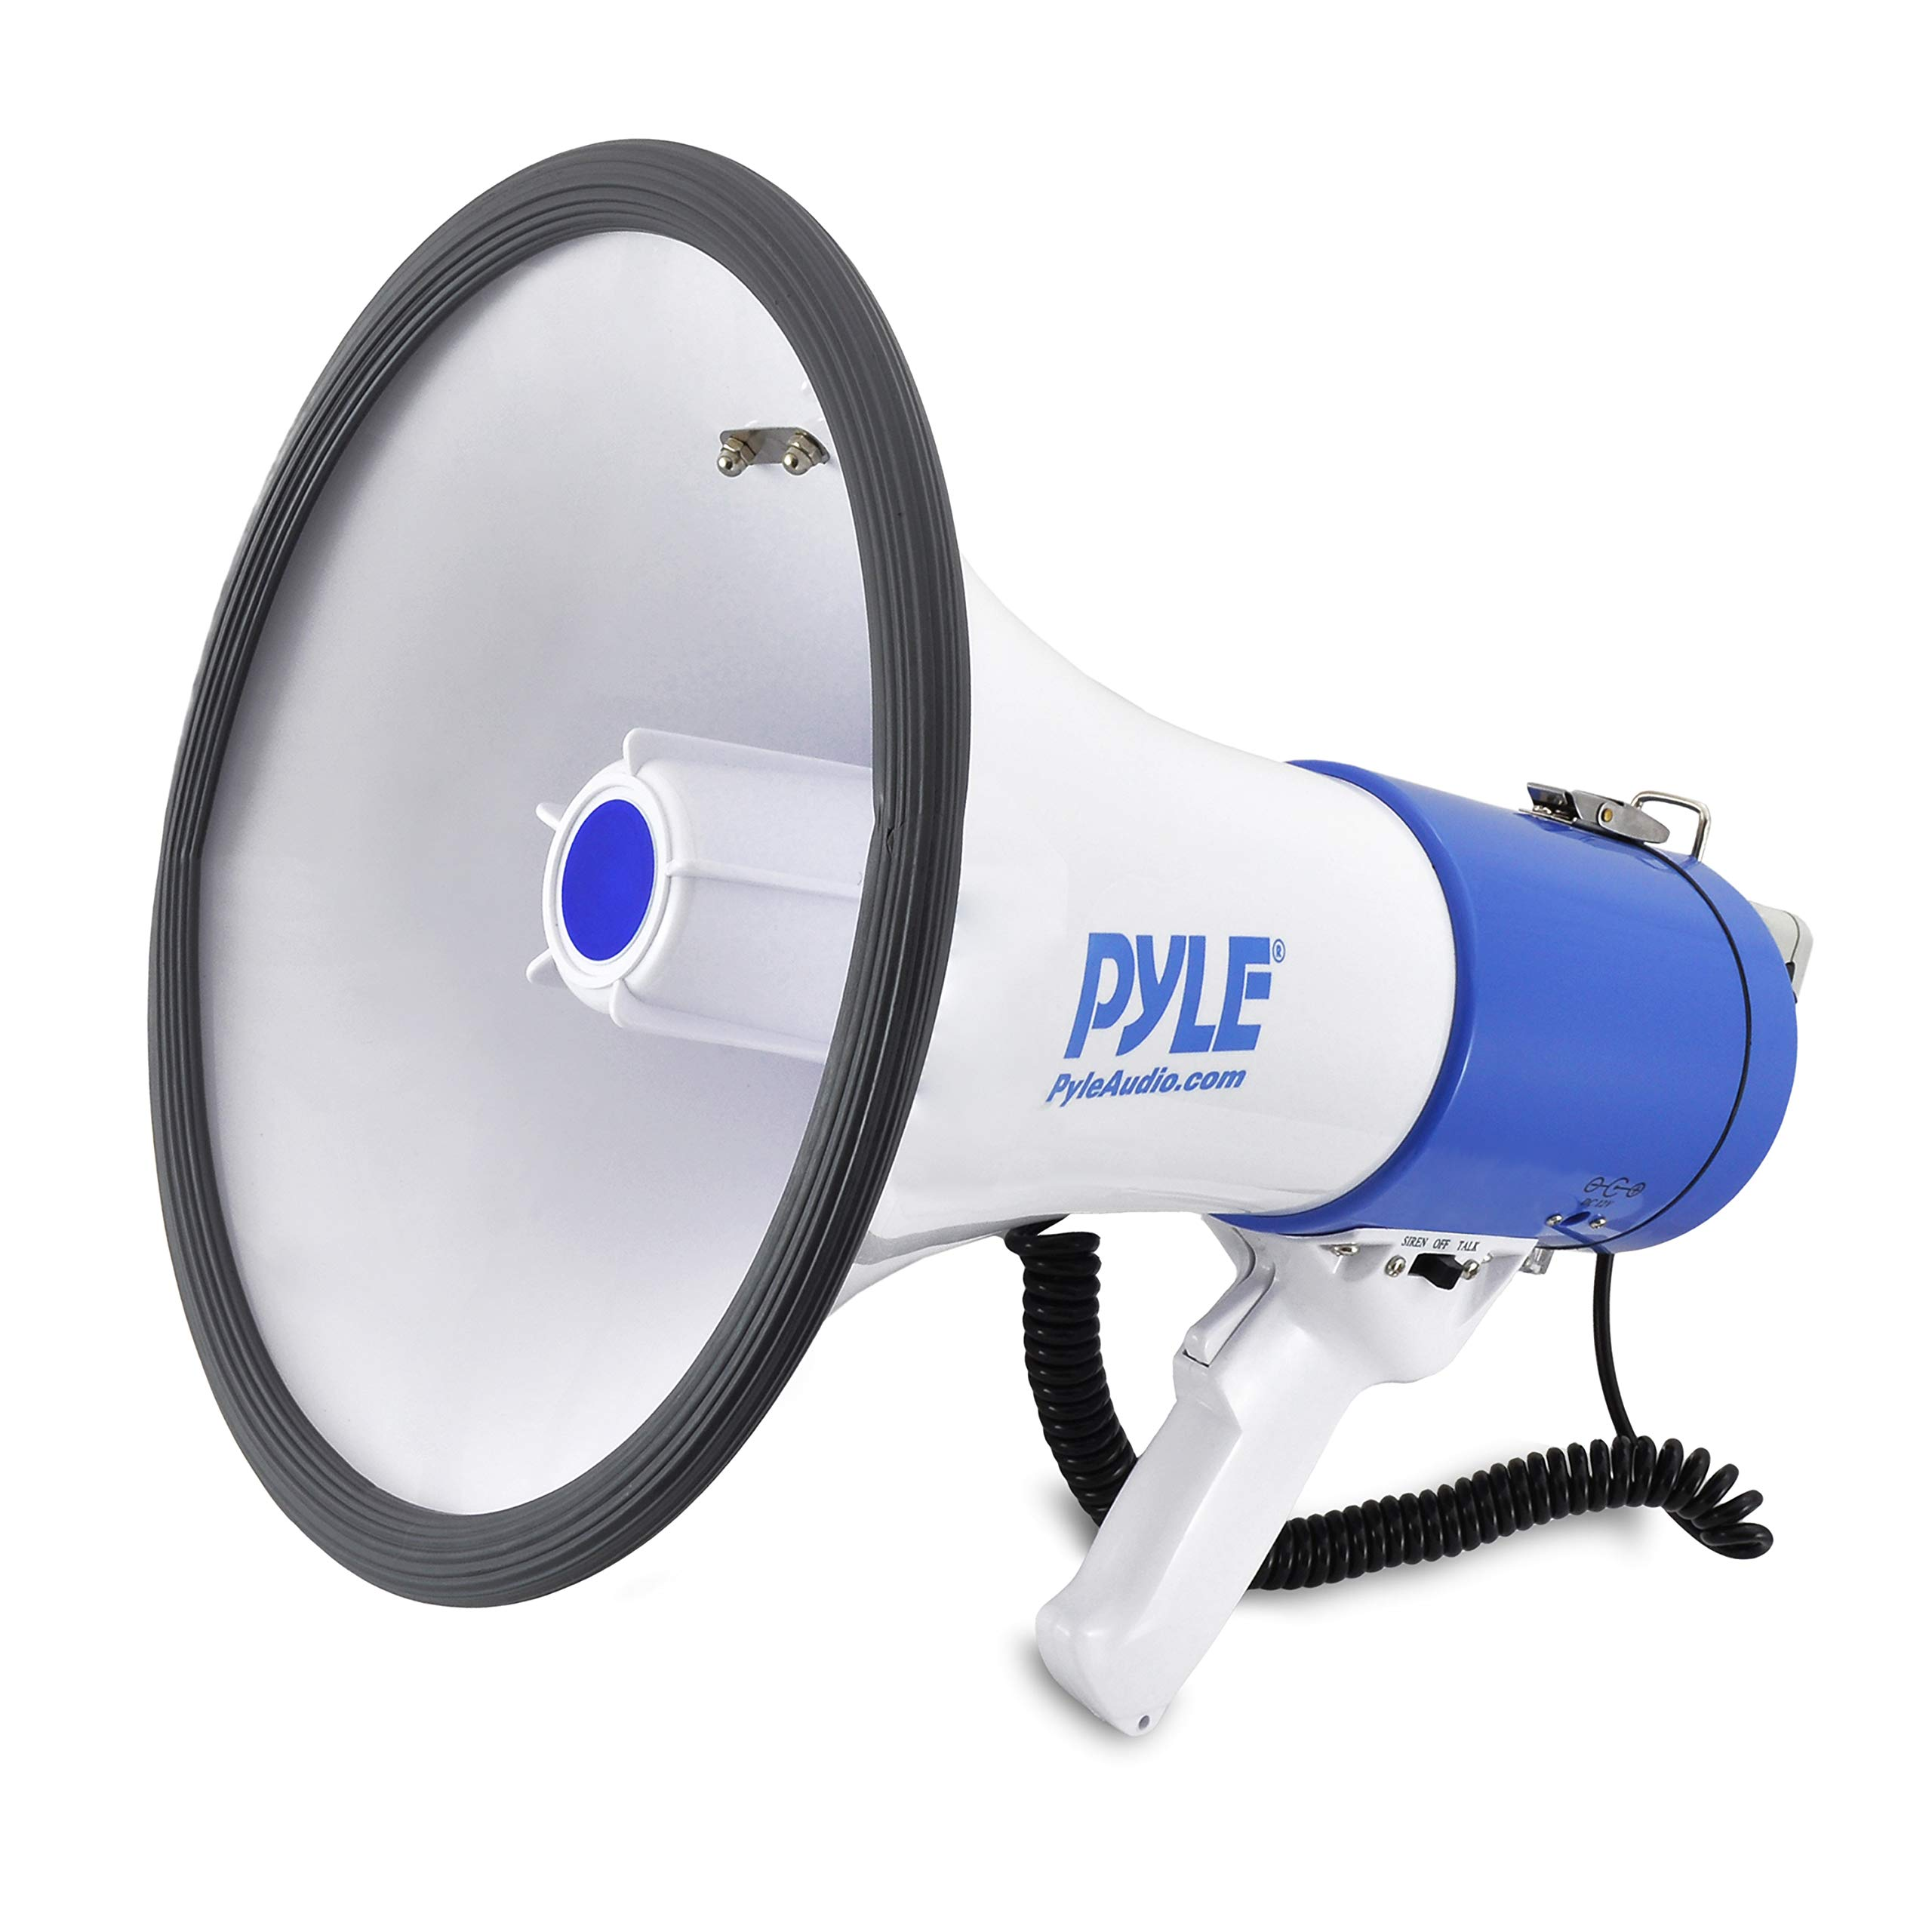 50 Watts Adjustable Vol Pyle Megaphone Speaker PA Bullhorn with Built-in Siren